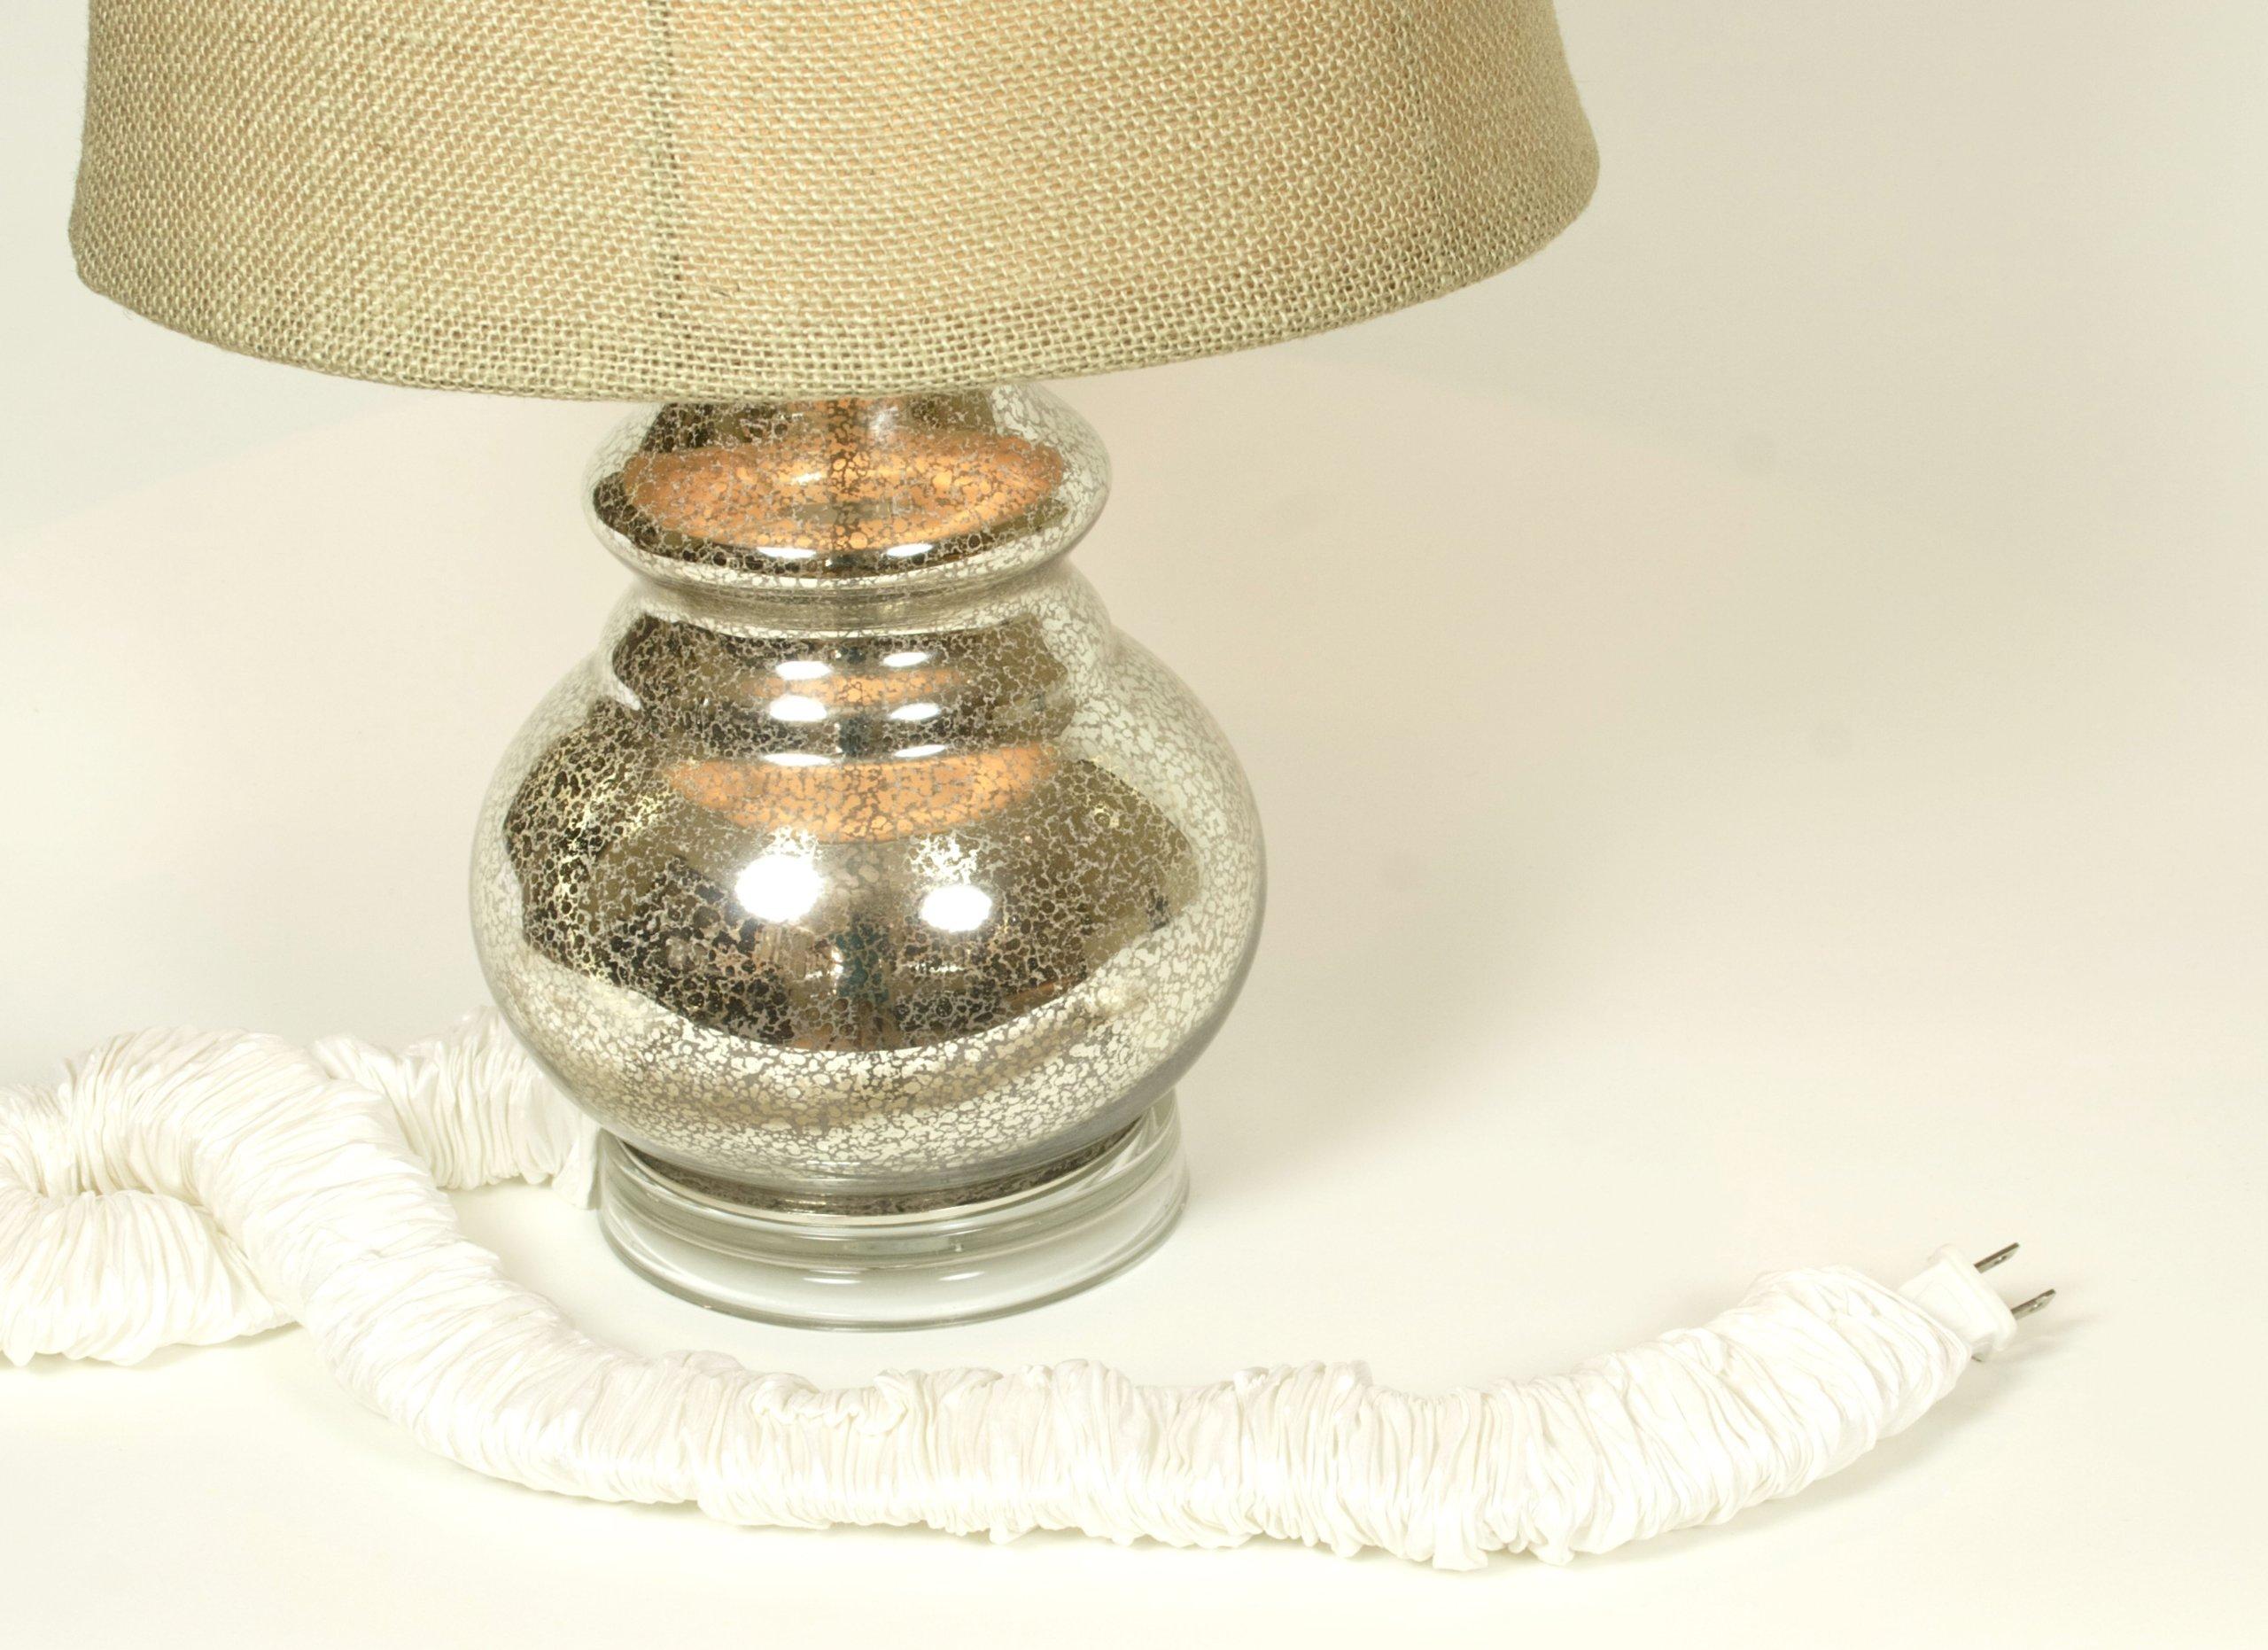 Pearl Silk Lamp Cord Cover 9 ft long 100% REAL SILK